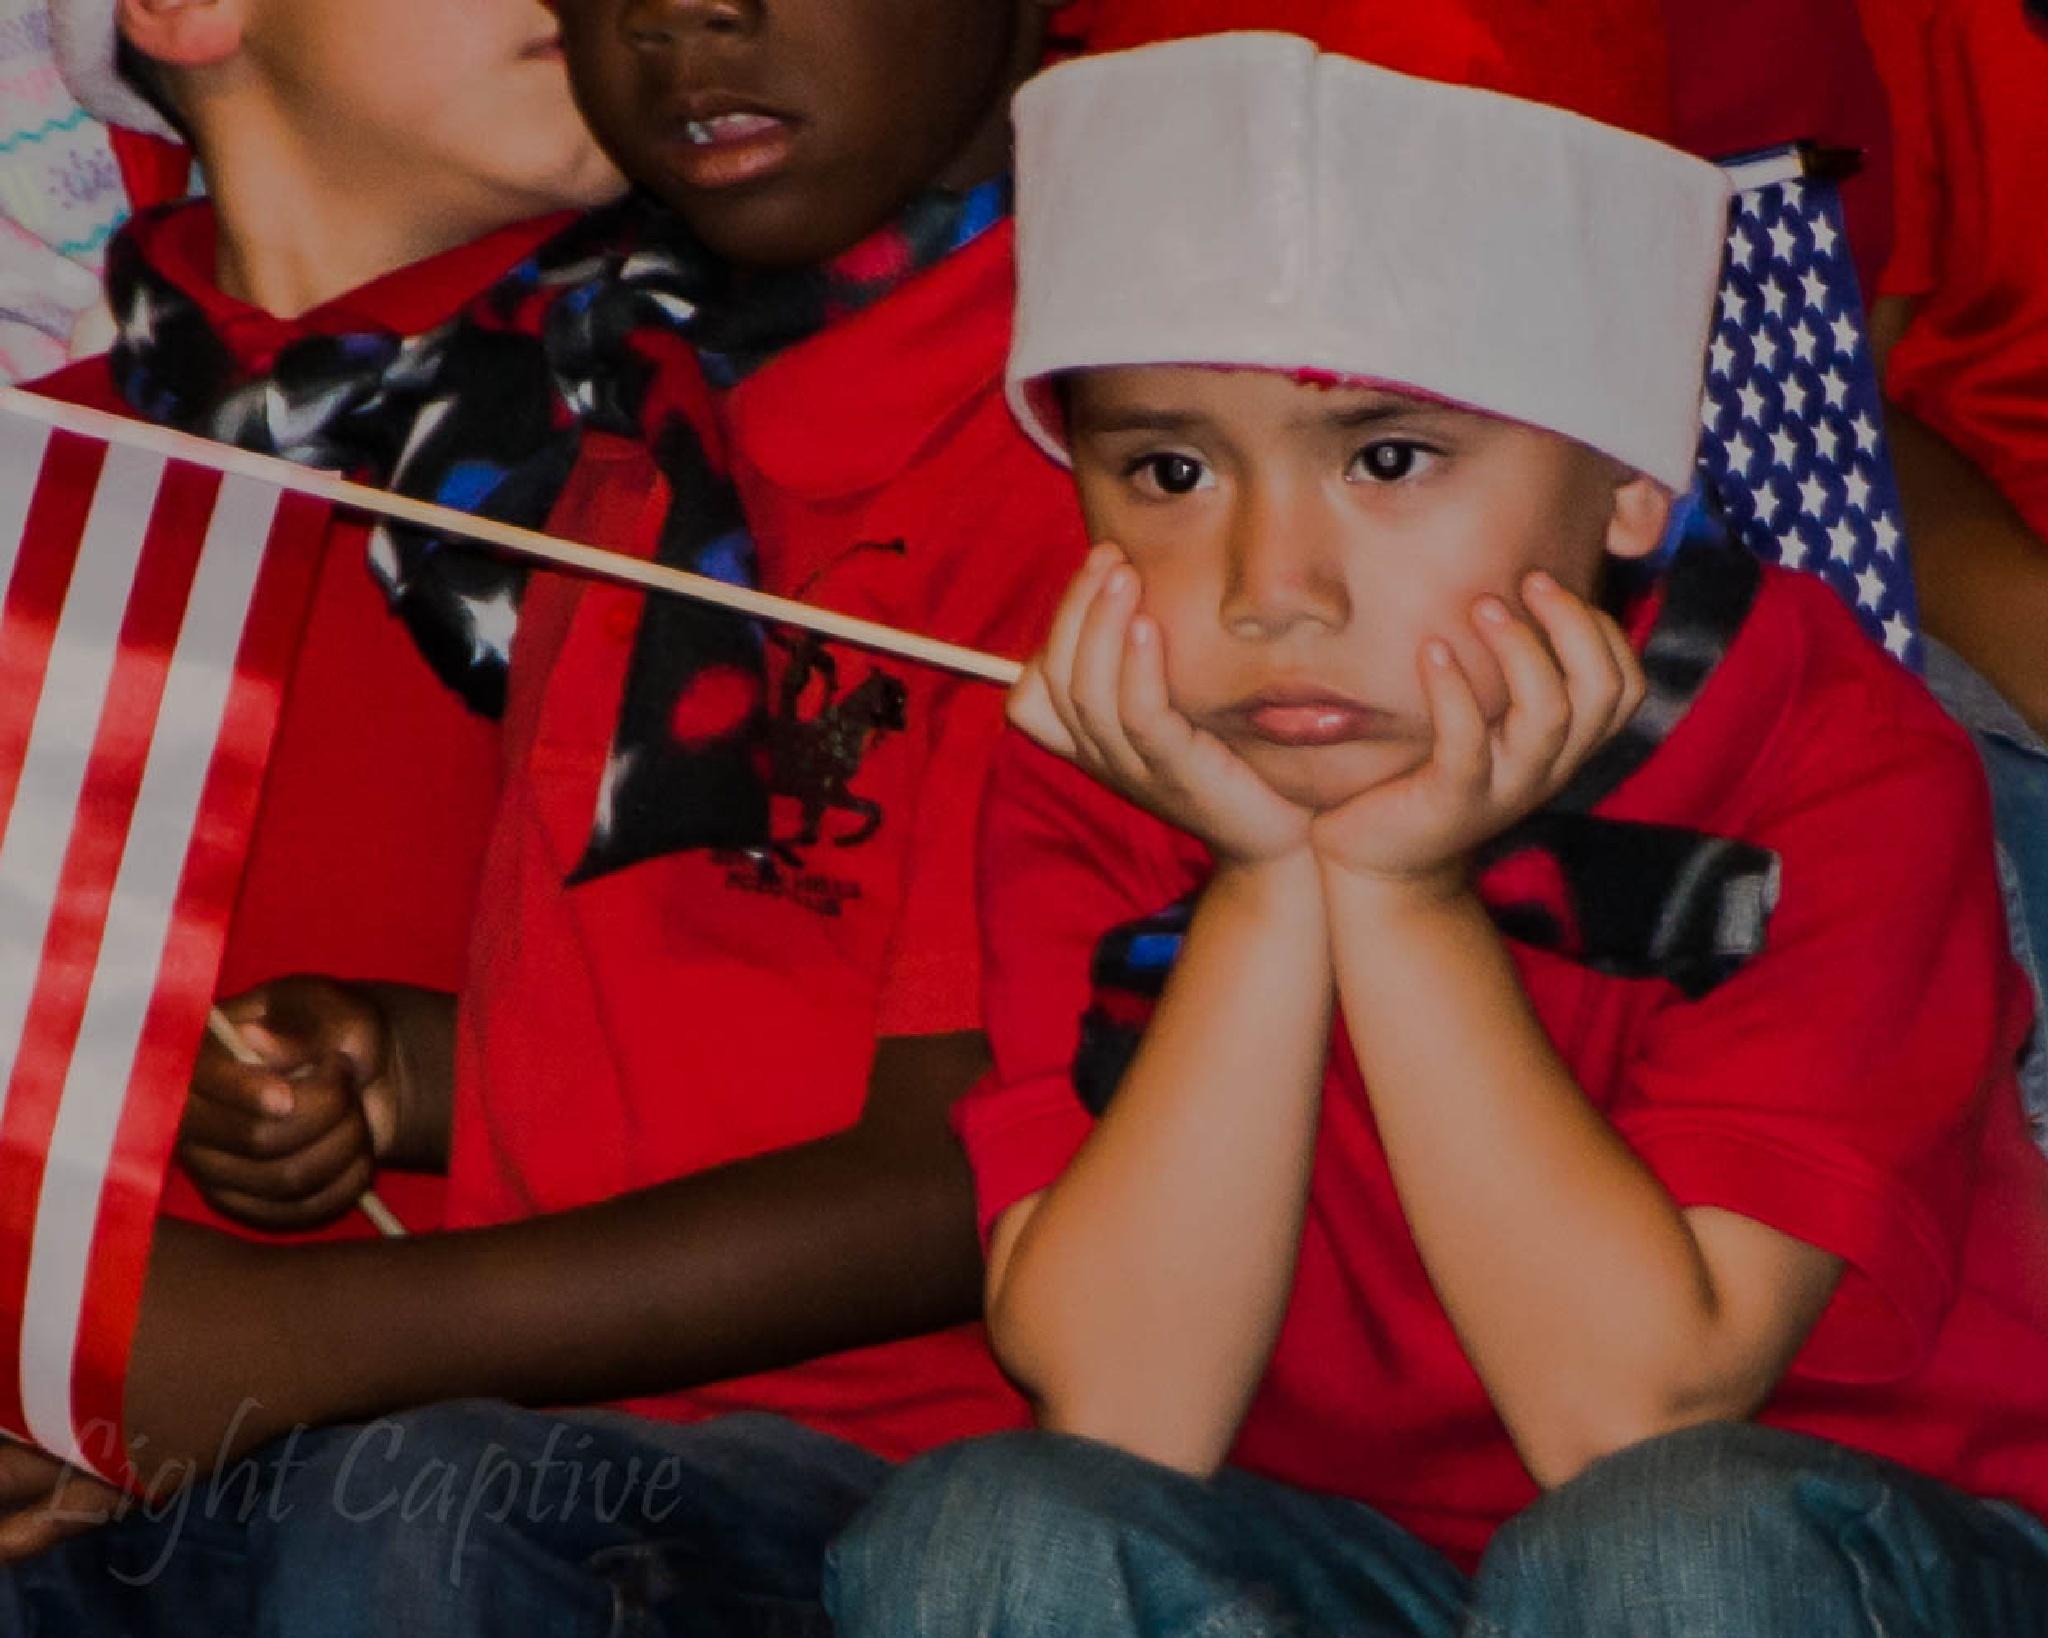 Merry, Merry, Whatever by Elisabeth Bartlett Gibson